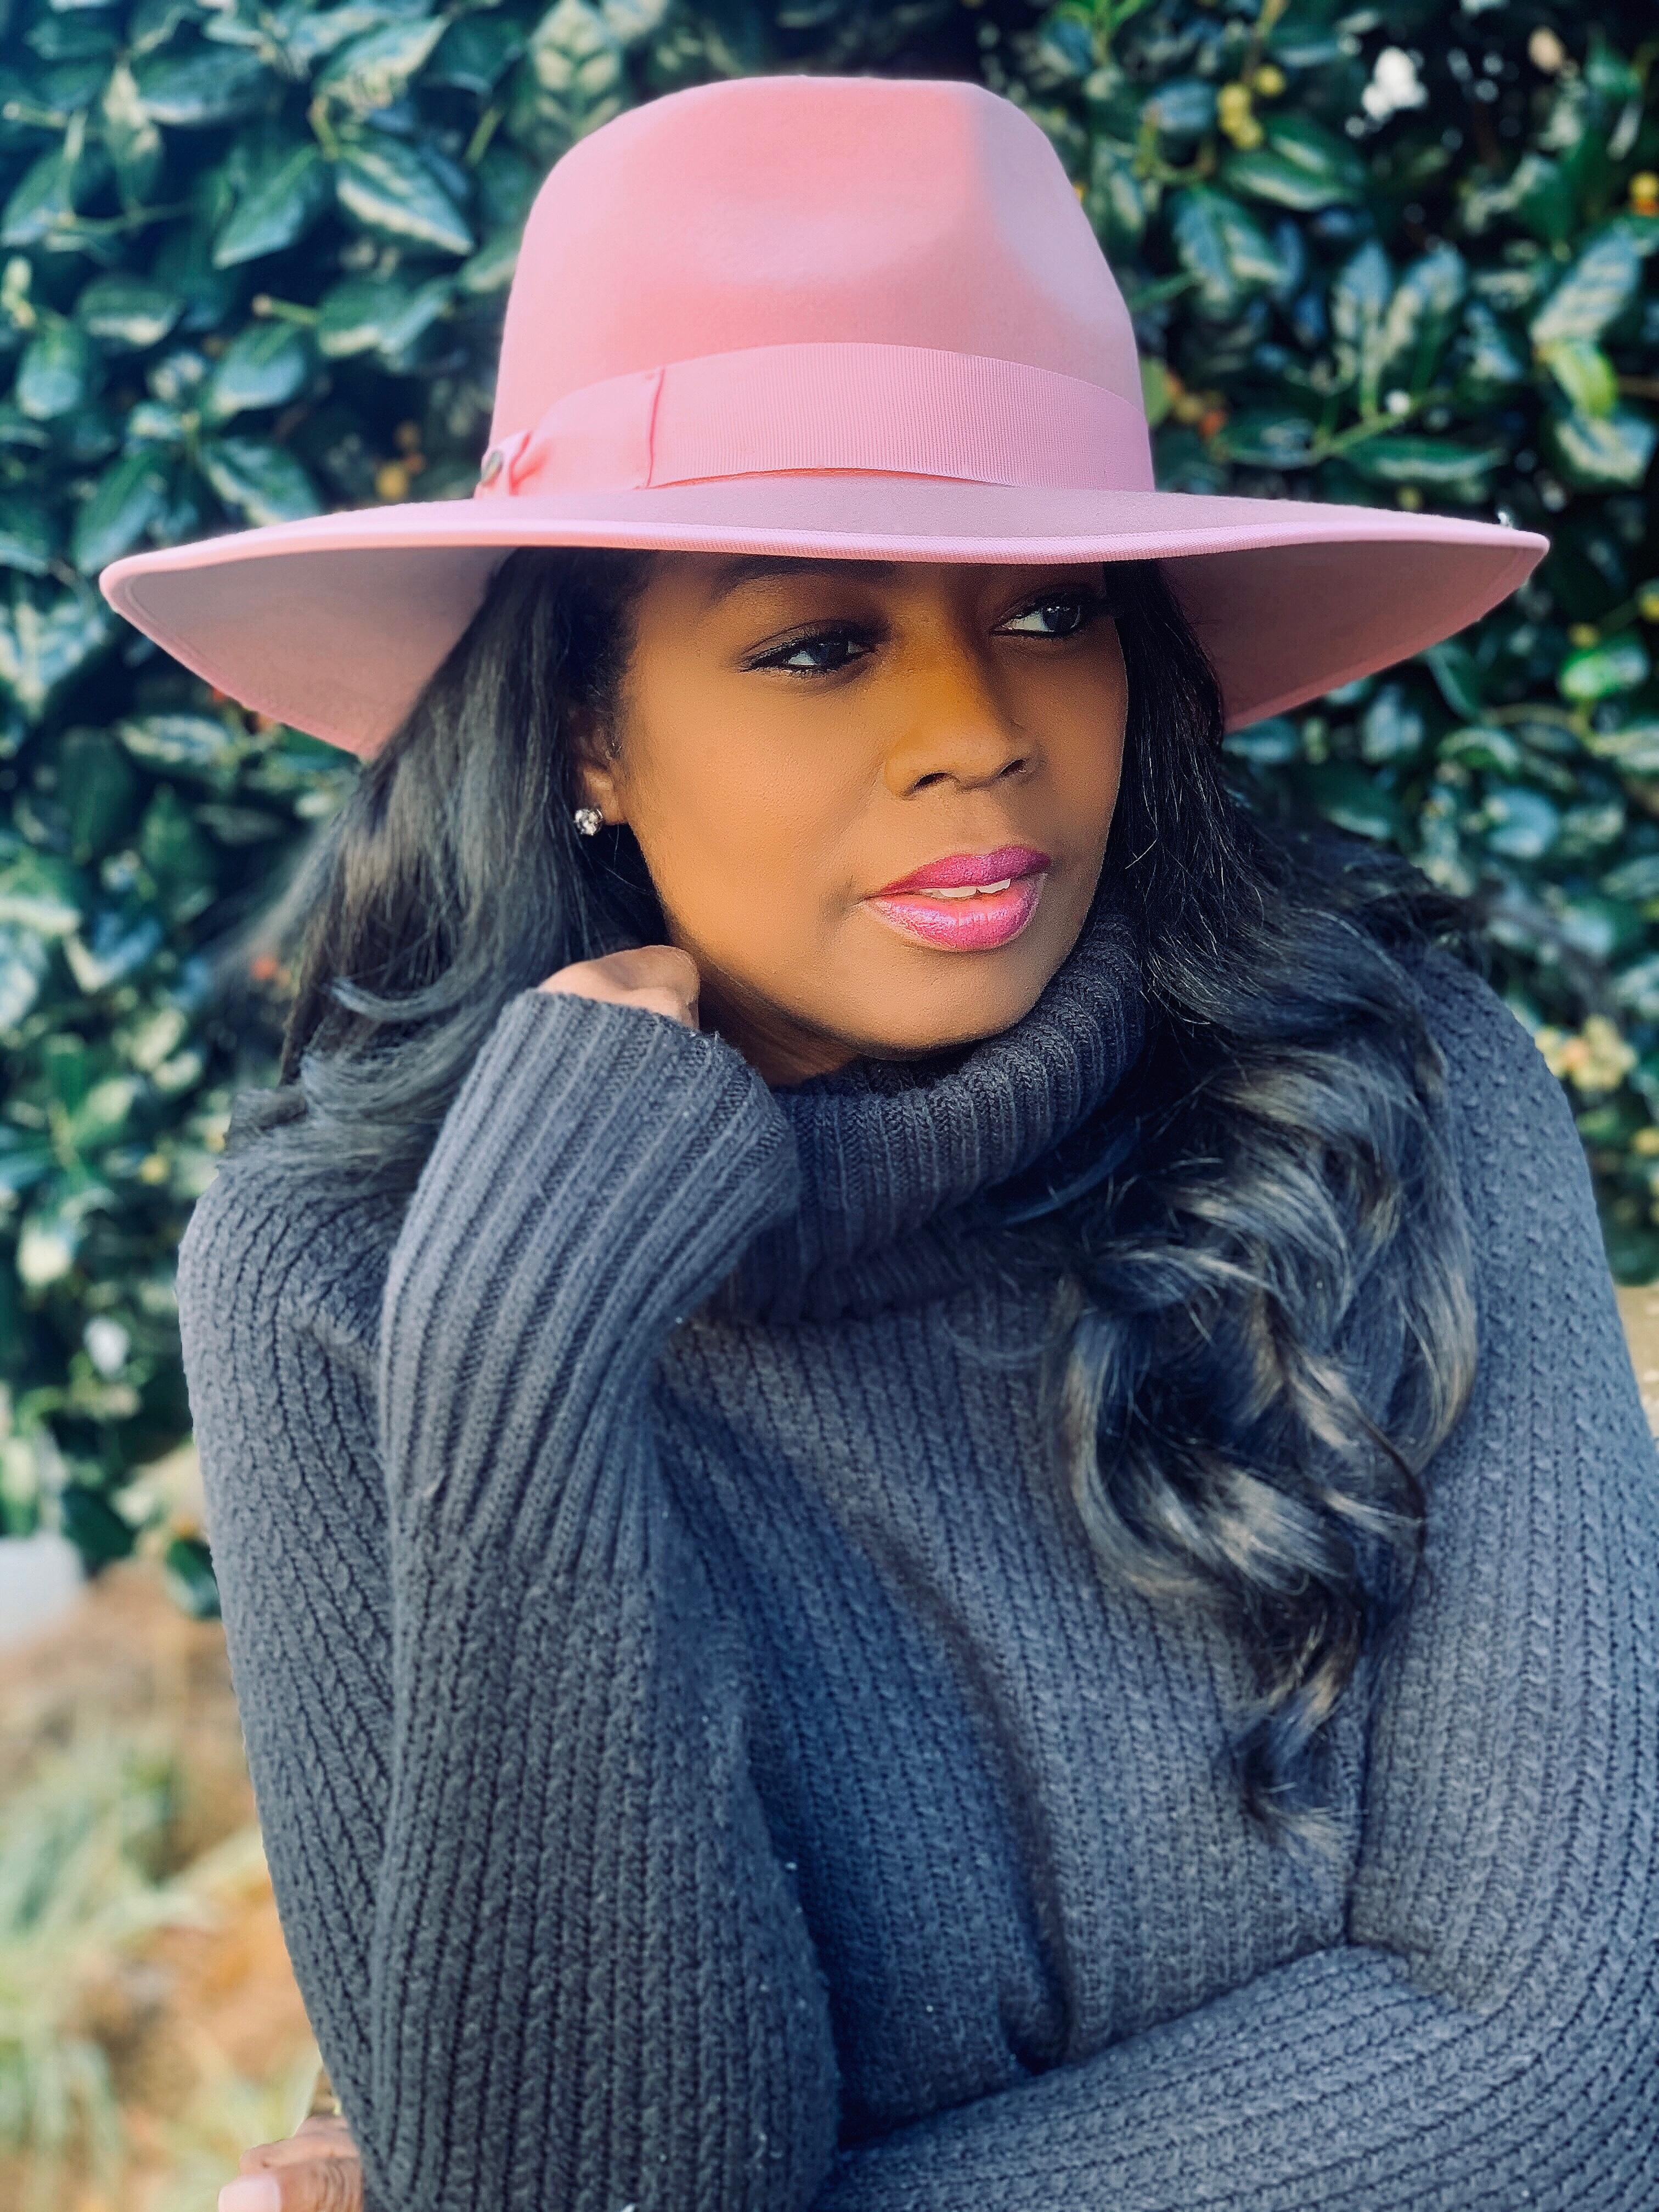 My Style: Capri Walrus Wide Brim Wool Felt Fedora Hat